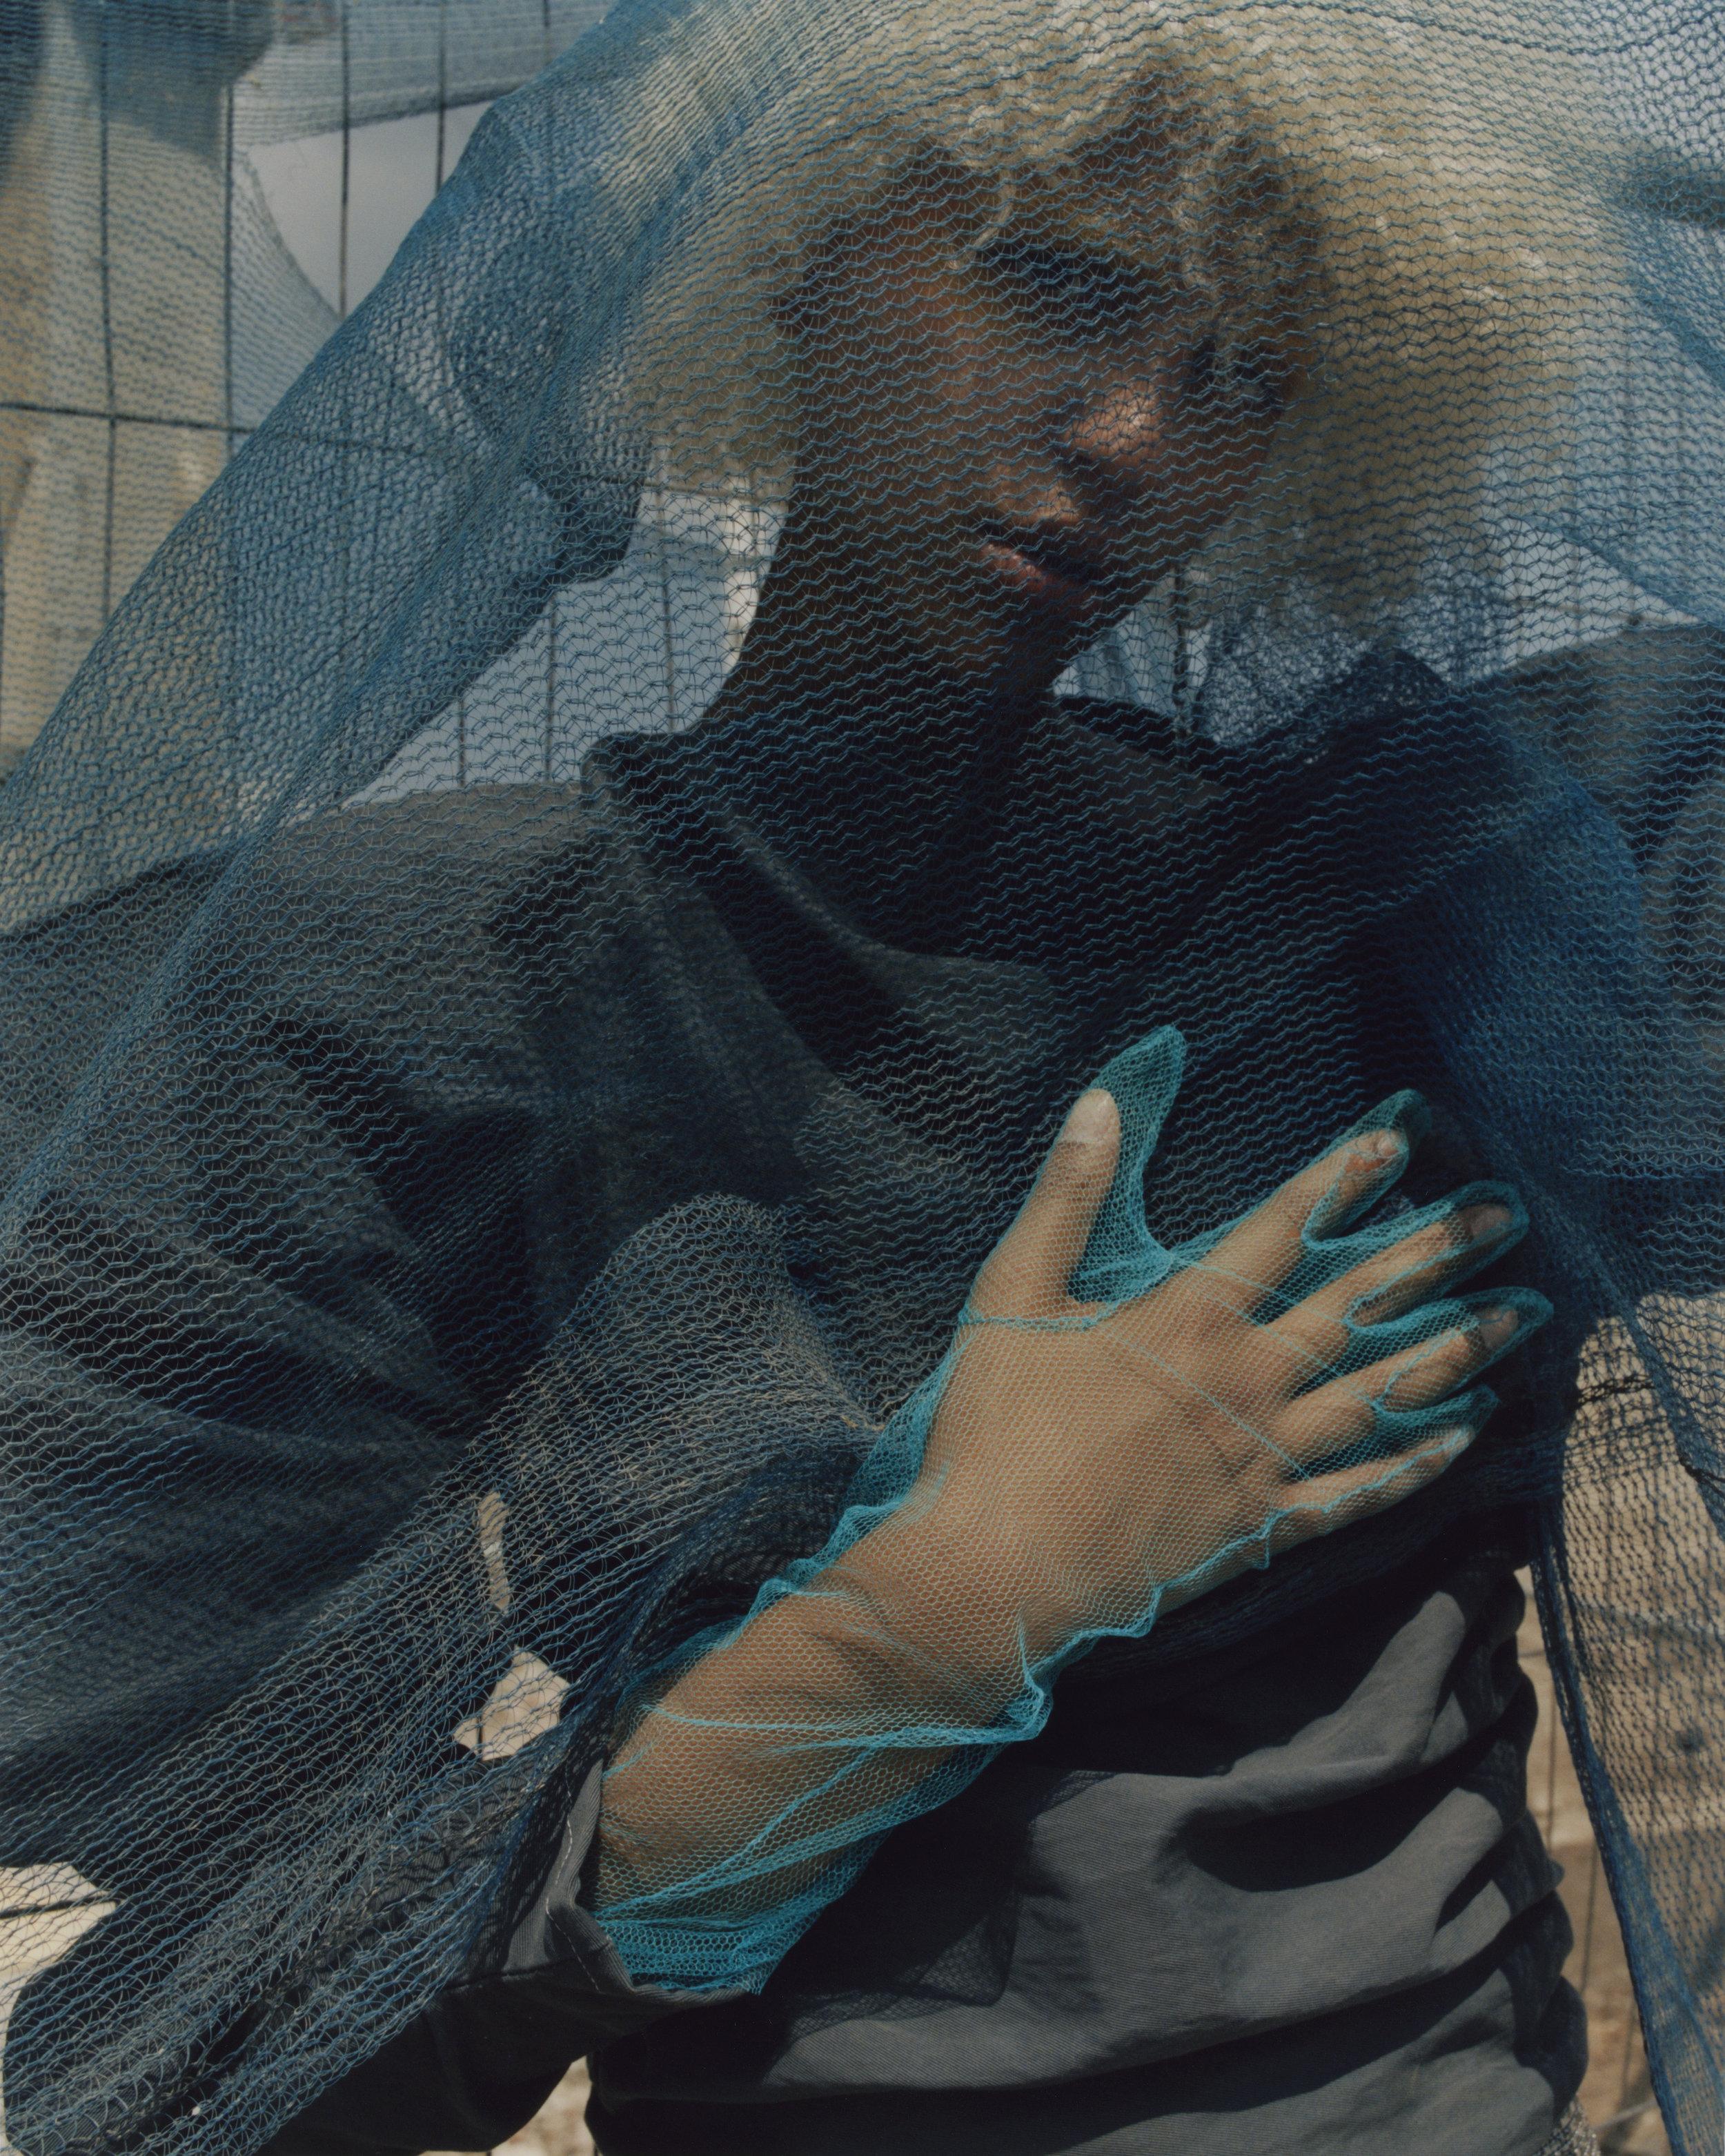 Nejilka for Glamcult Magazine